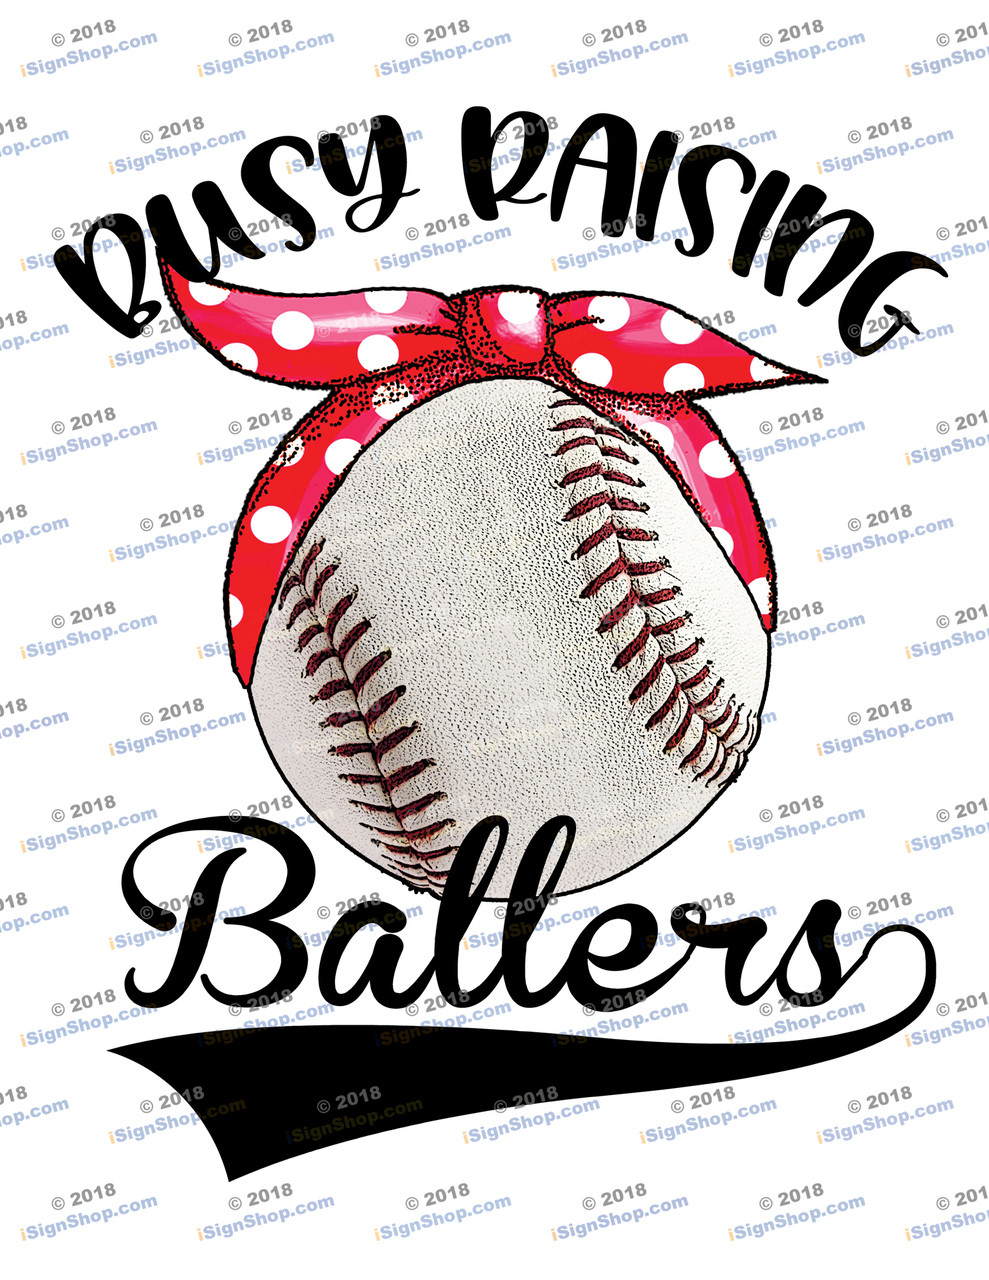 Busy raising ballers baseball Sublimation Print